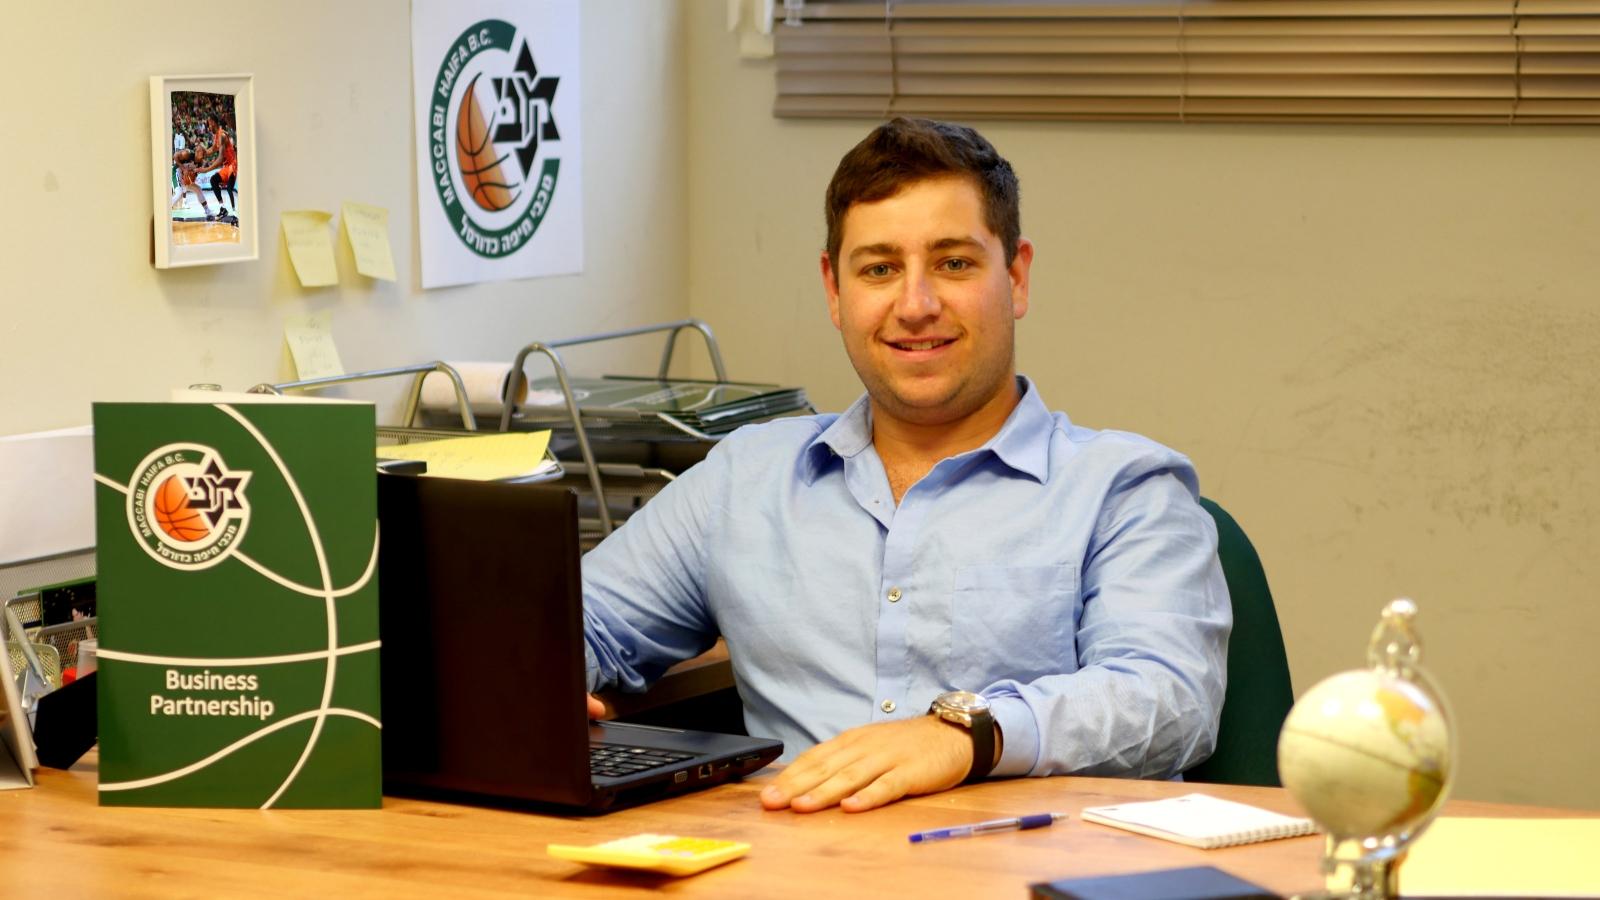 Lawrence Roodenburg from Boston interning at Maccabi Haifa Basketball Headquarters. Photo courtesy of Onward Israel